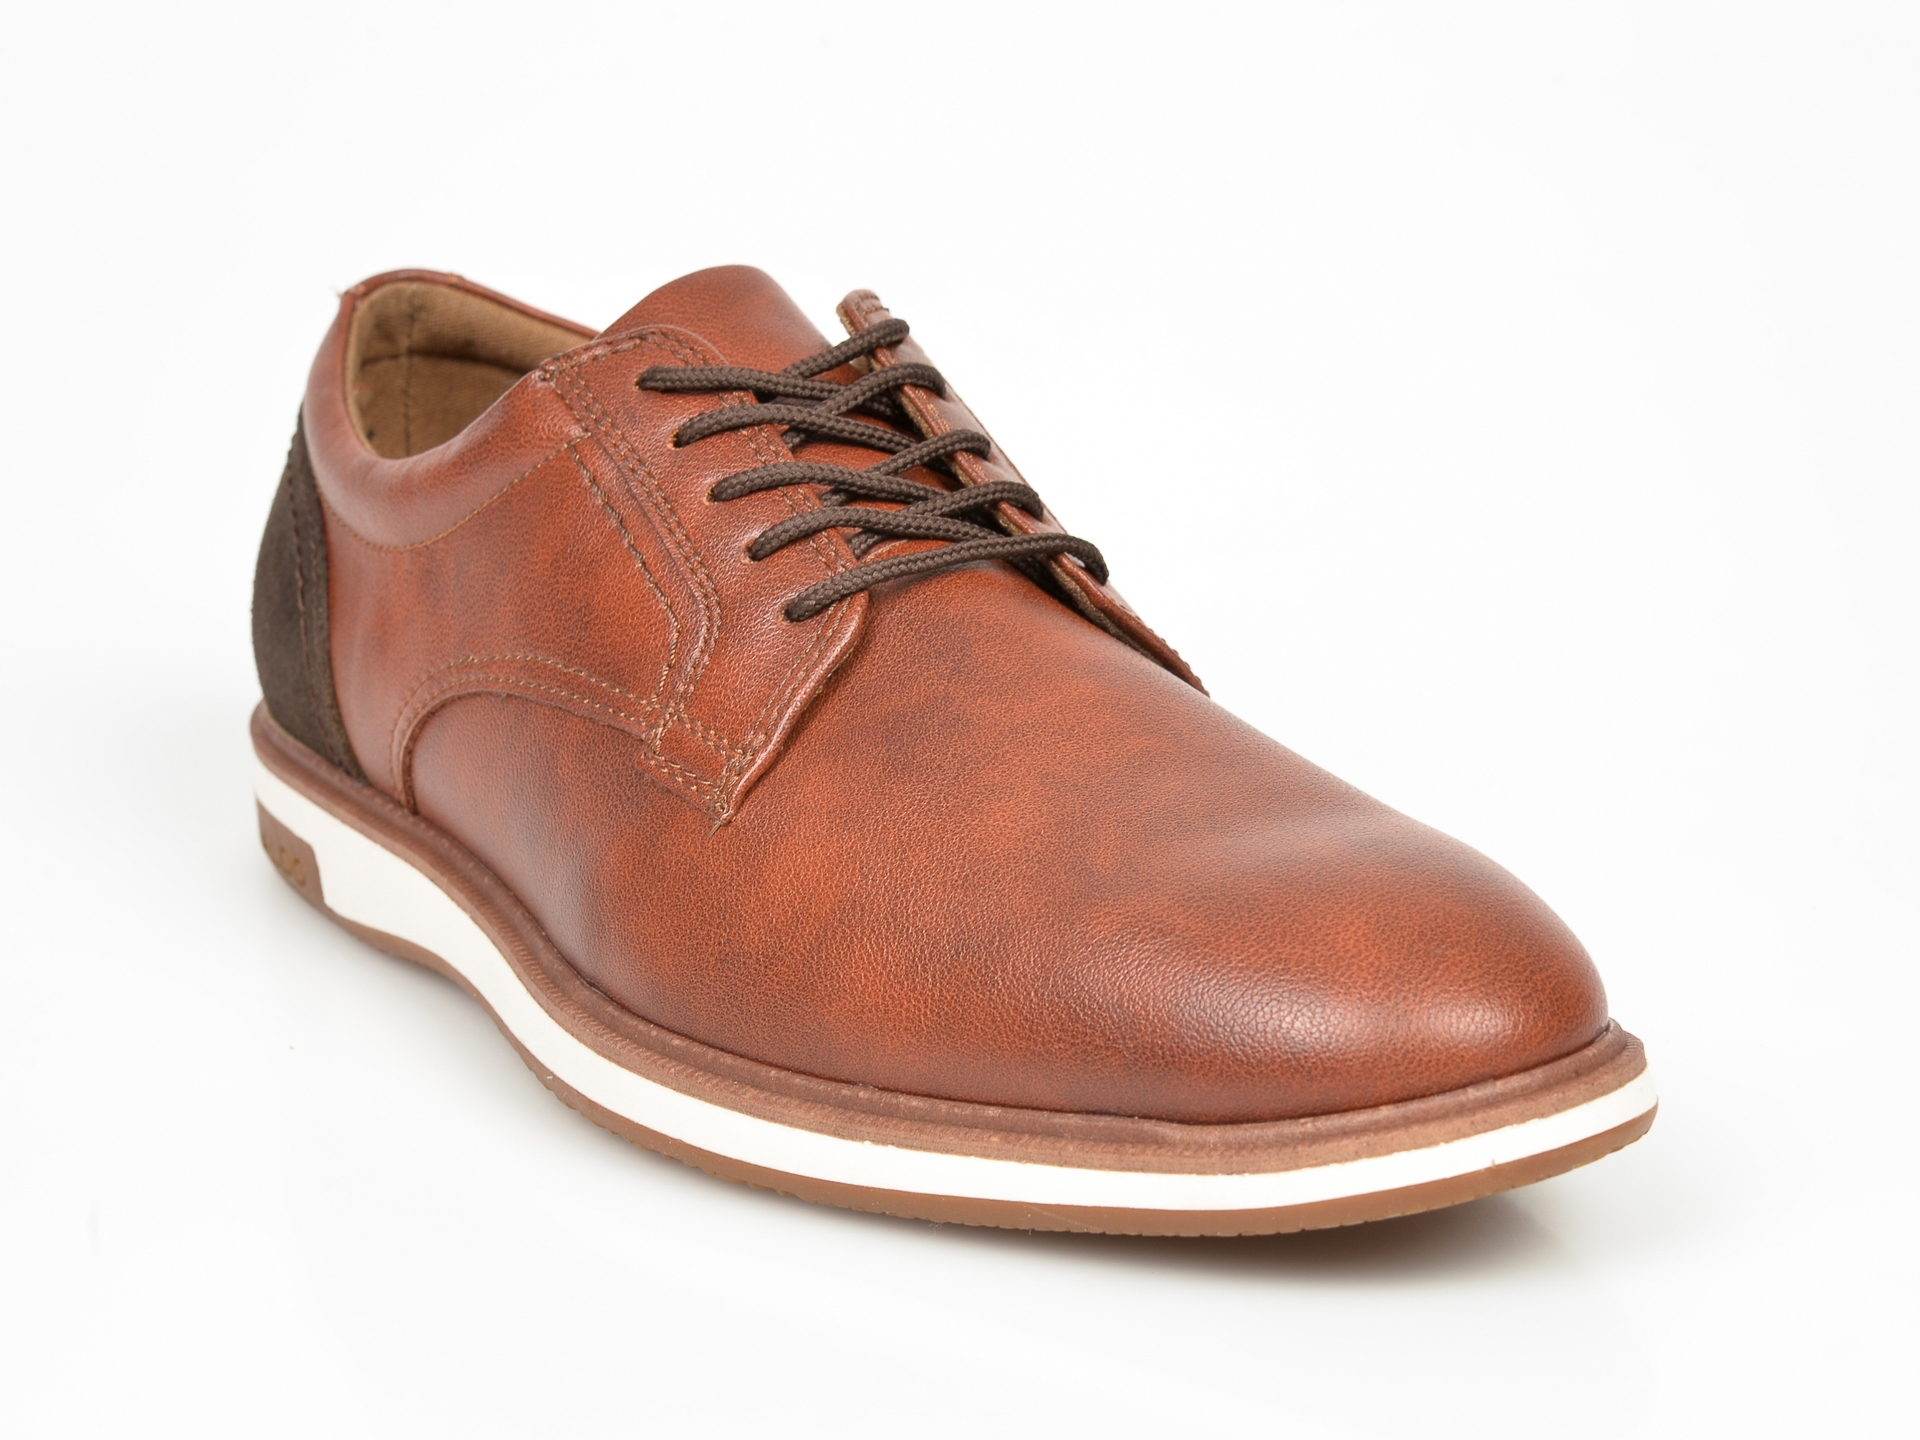 Pantofi Aldo Maro, Asosen, Din Piele Ecologica